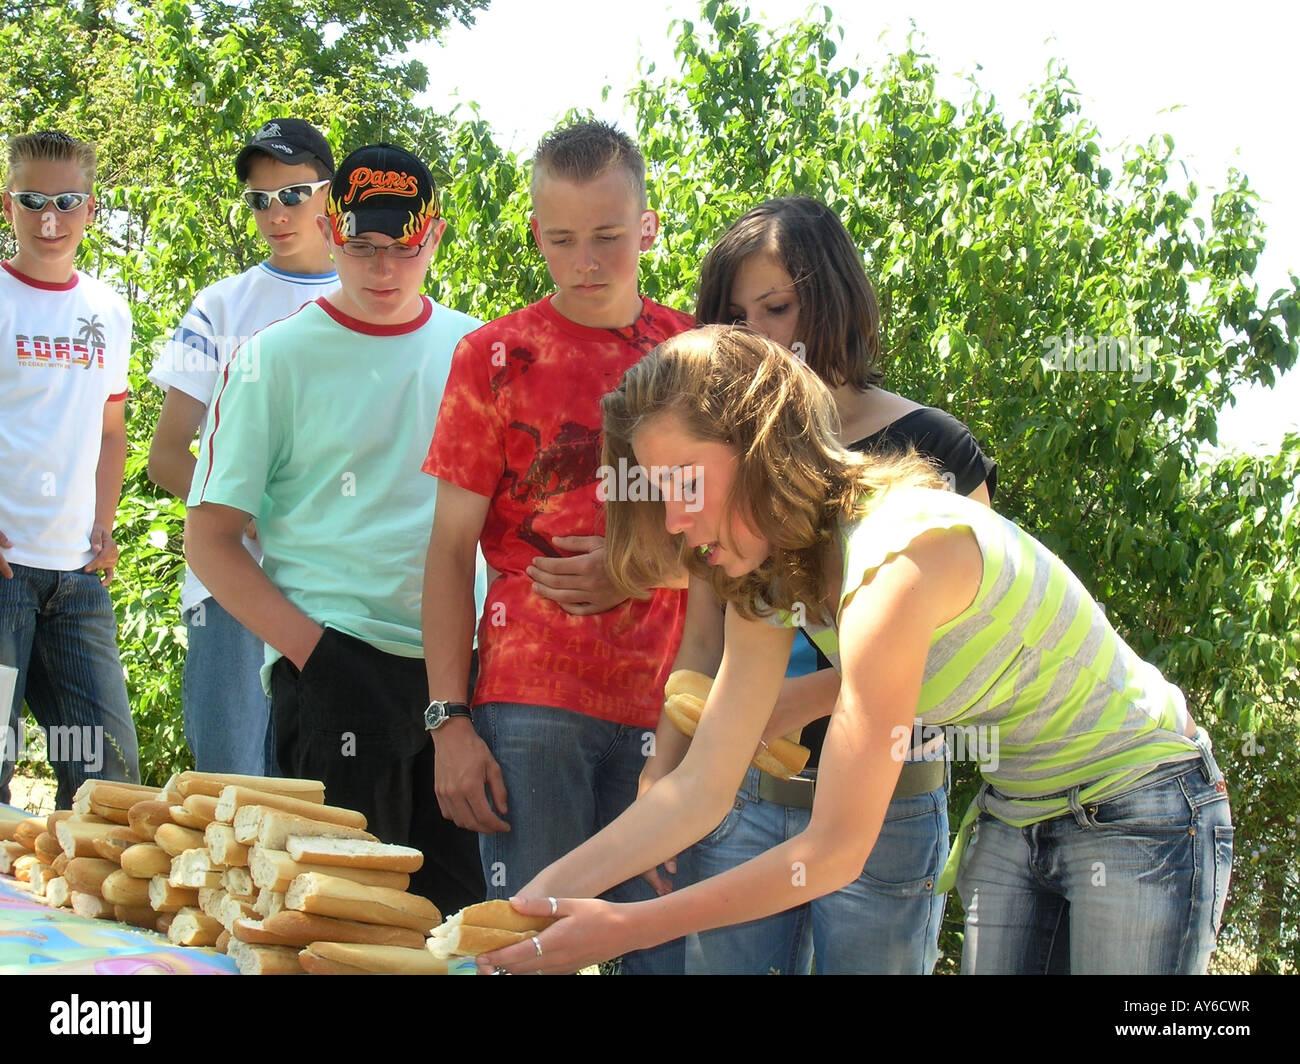 Group of schoolkids enjoying picnic in Bois de Boulogne Paris France - Stock Image